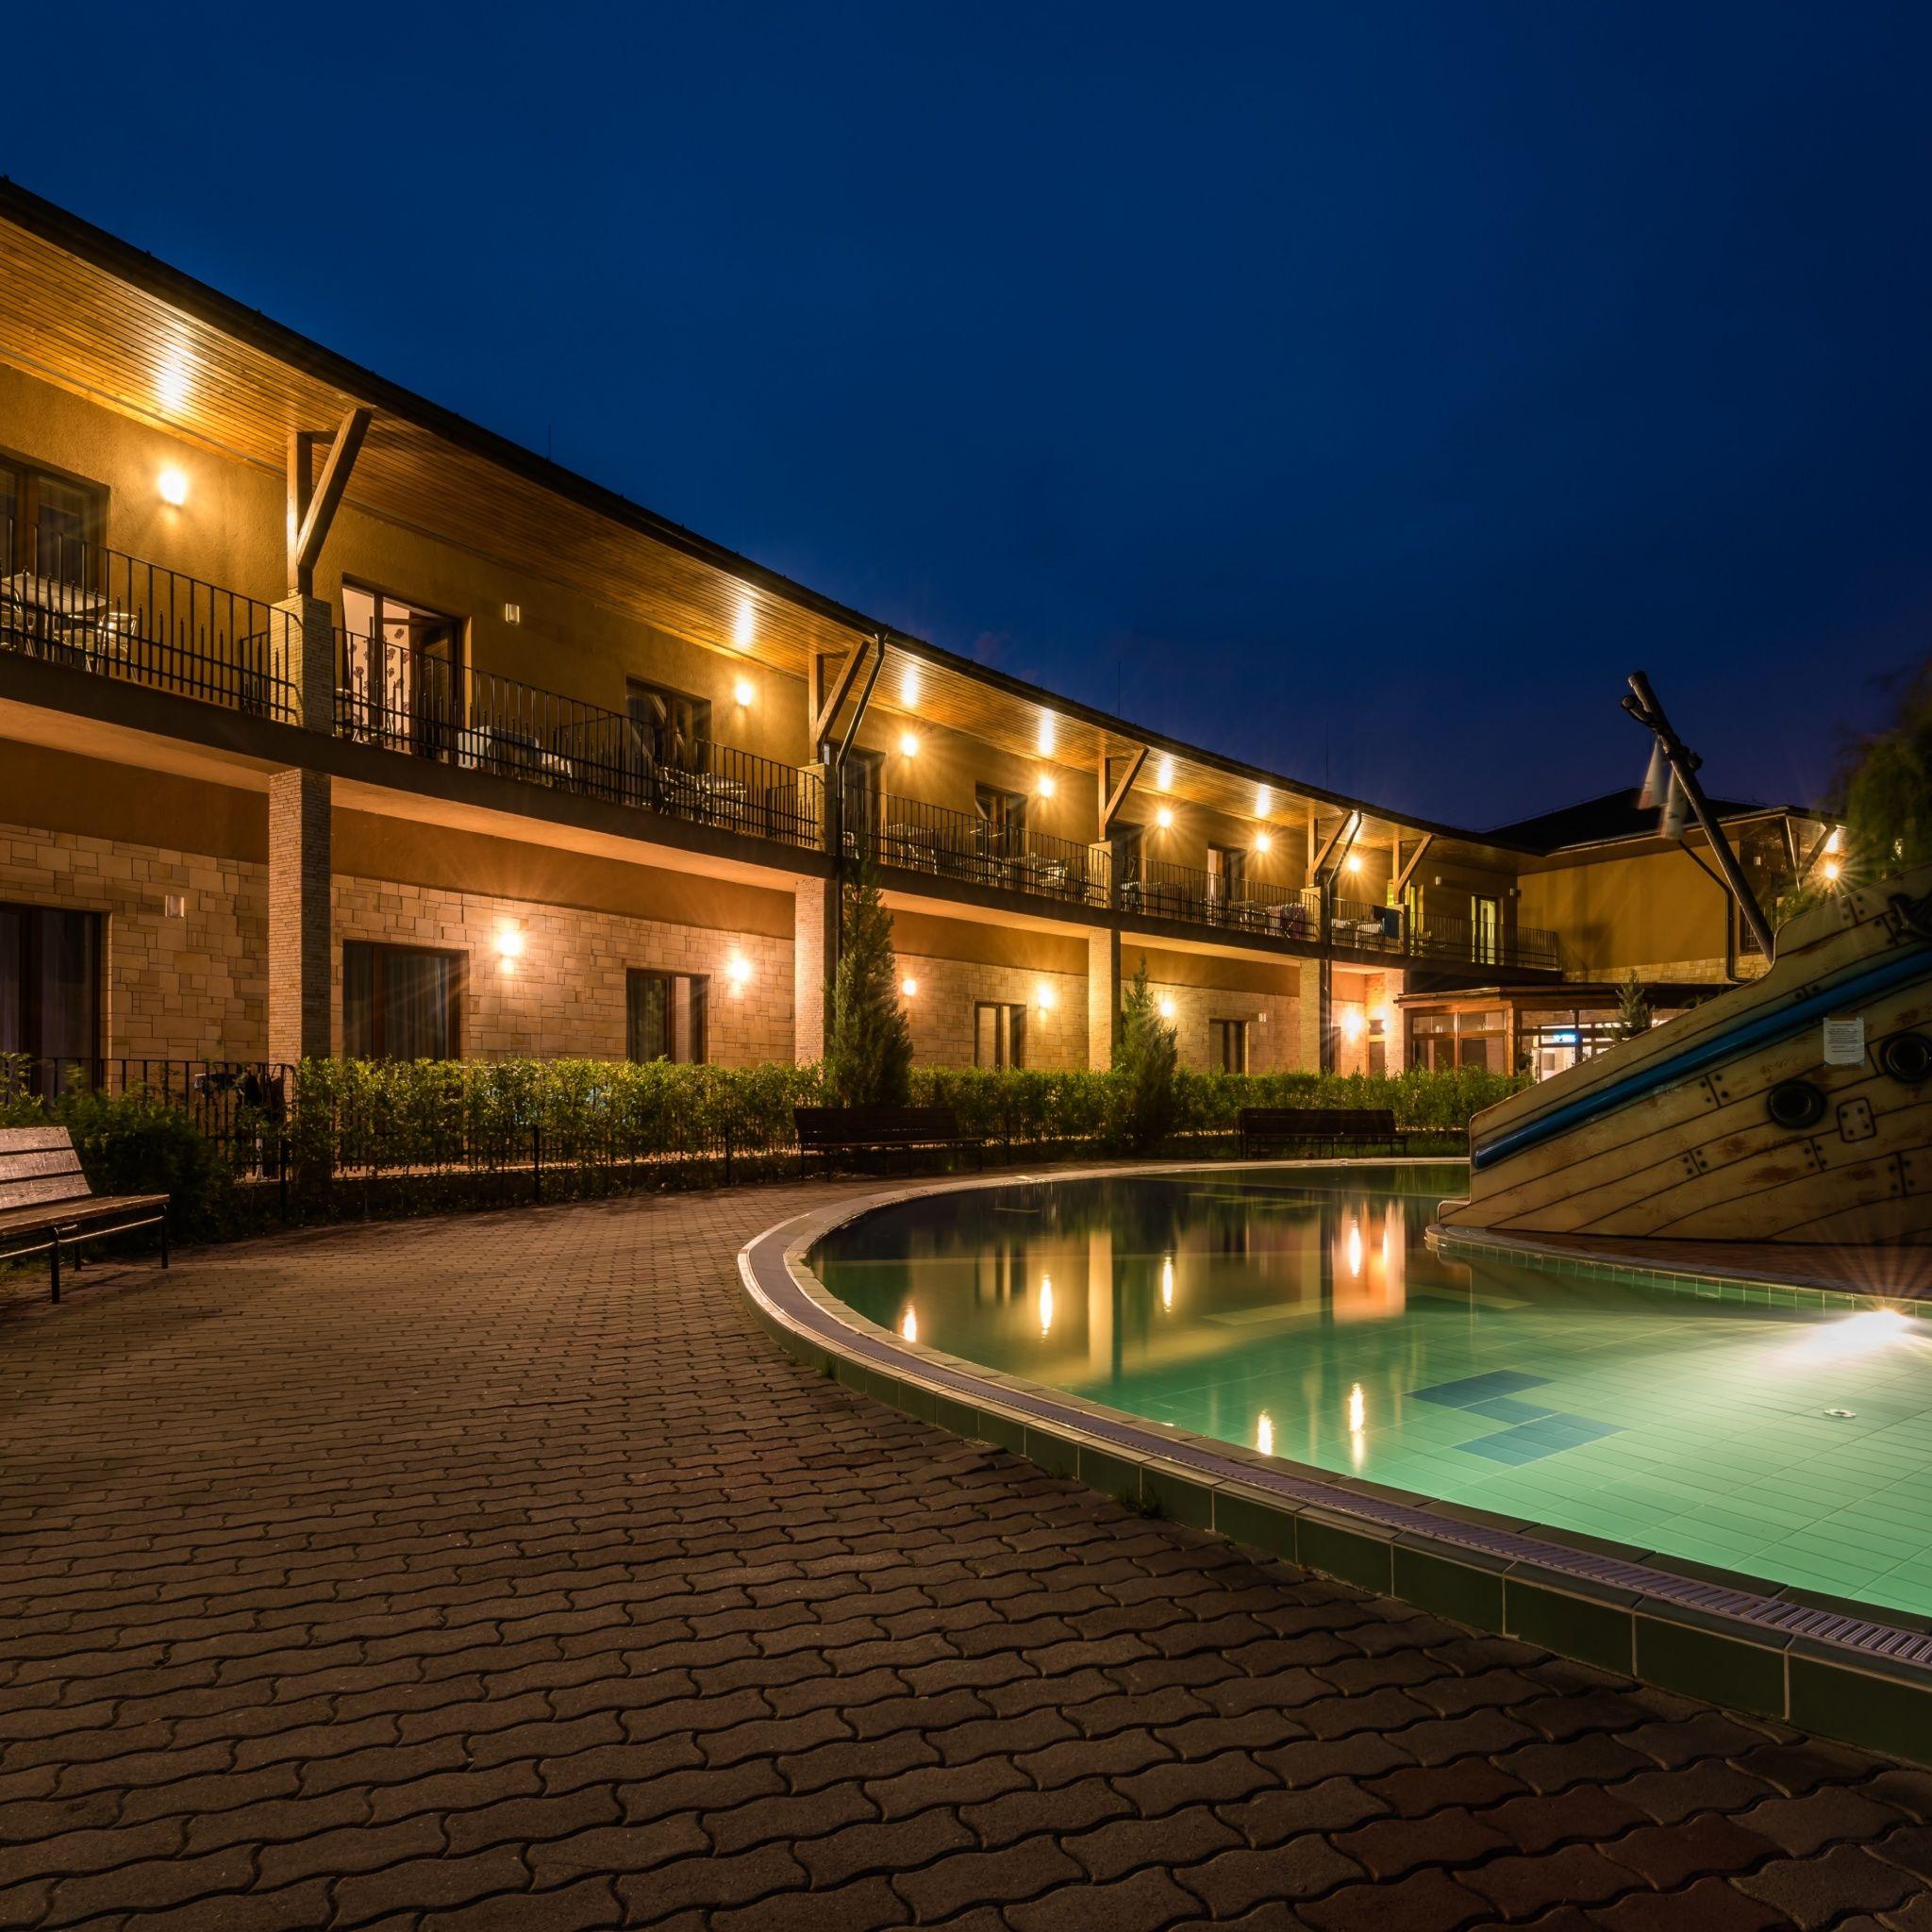 Kristály Hotel Ráckeve - Hotel Termálkristály